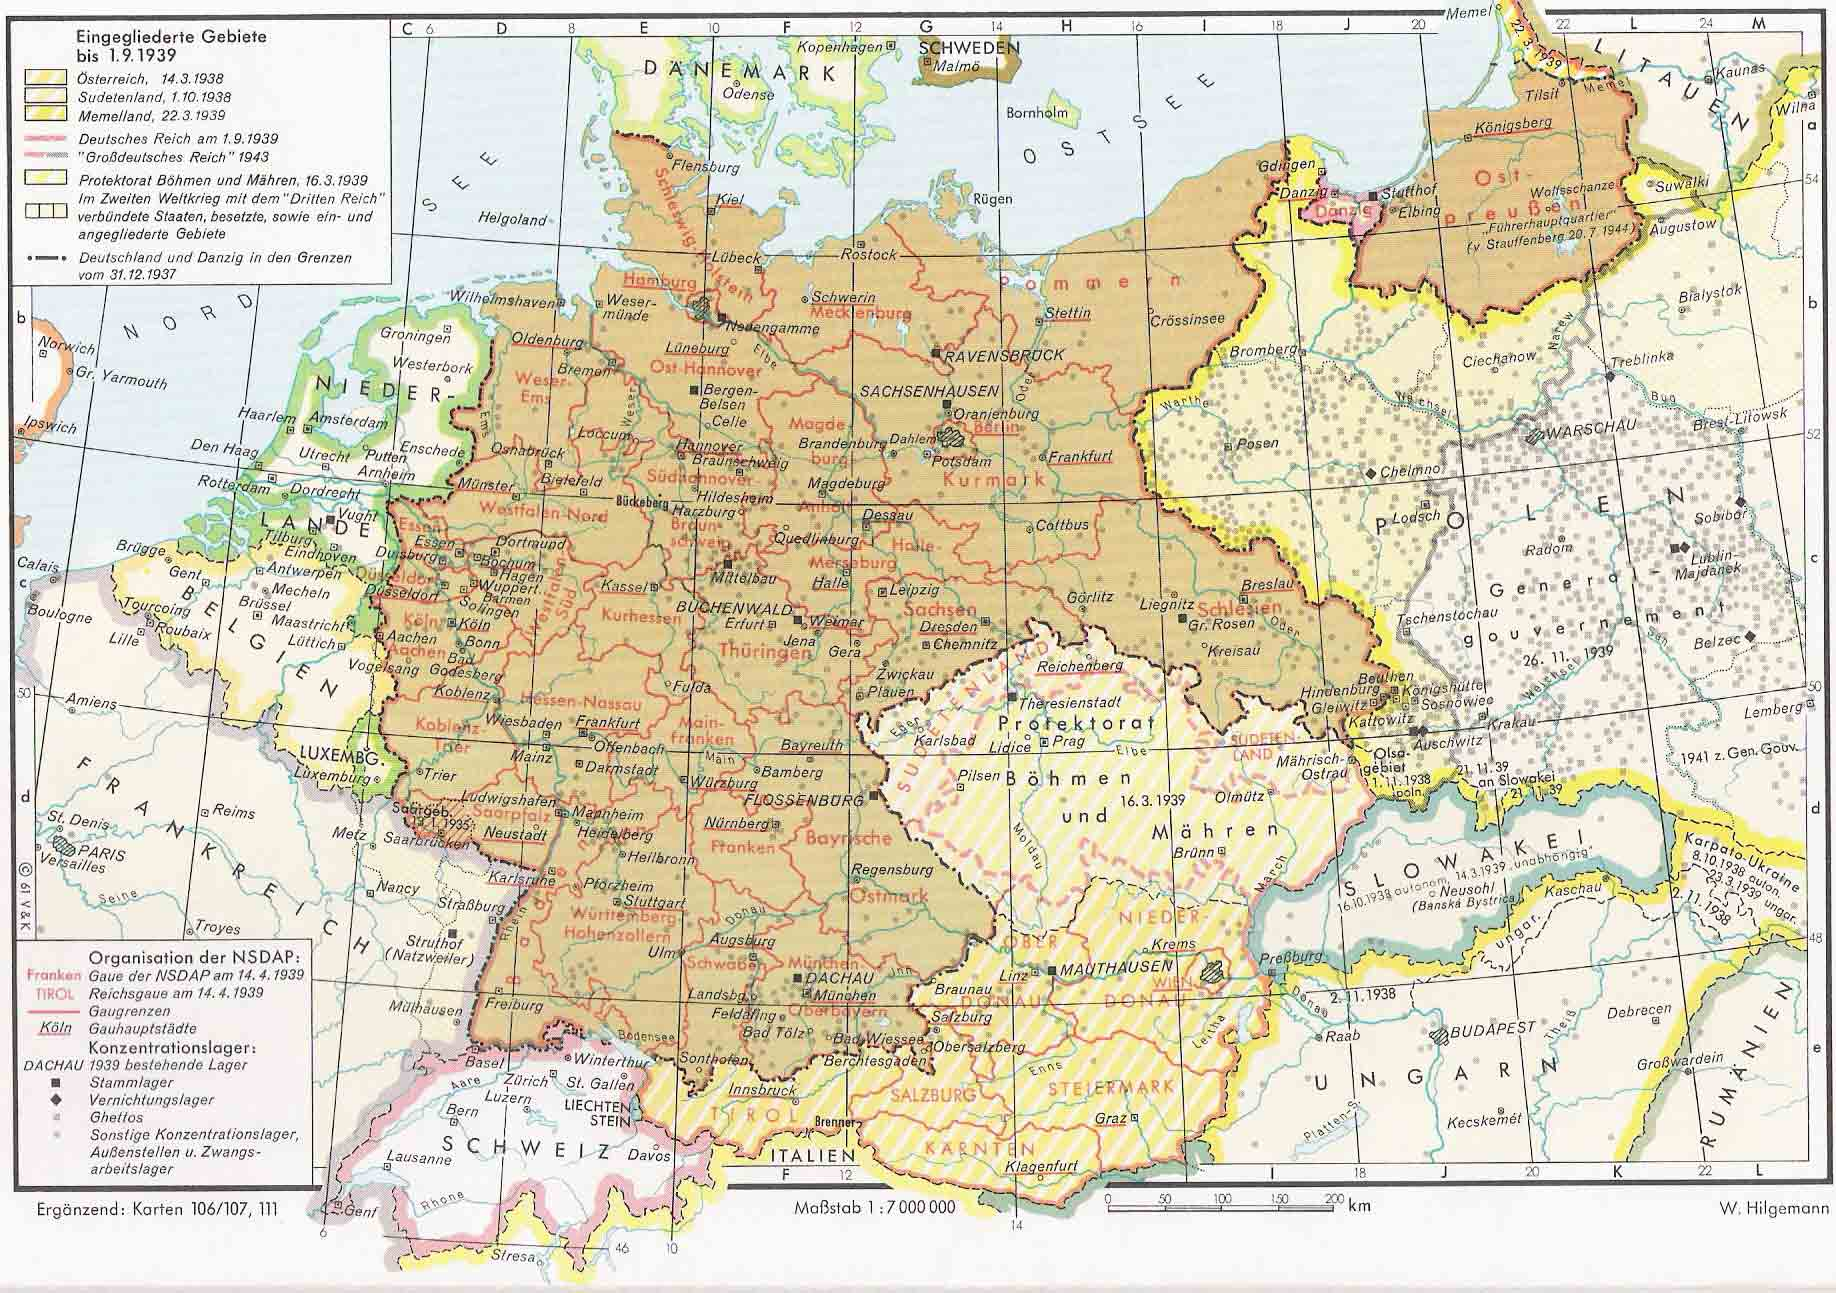 Expansionismo nazi 1937-1939